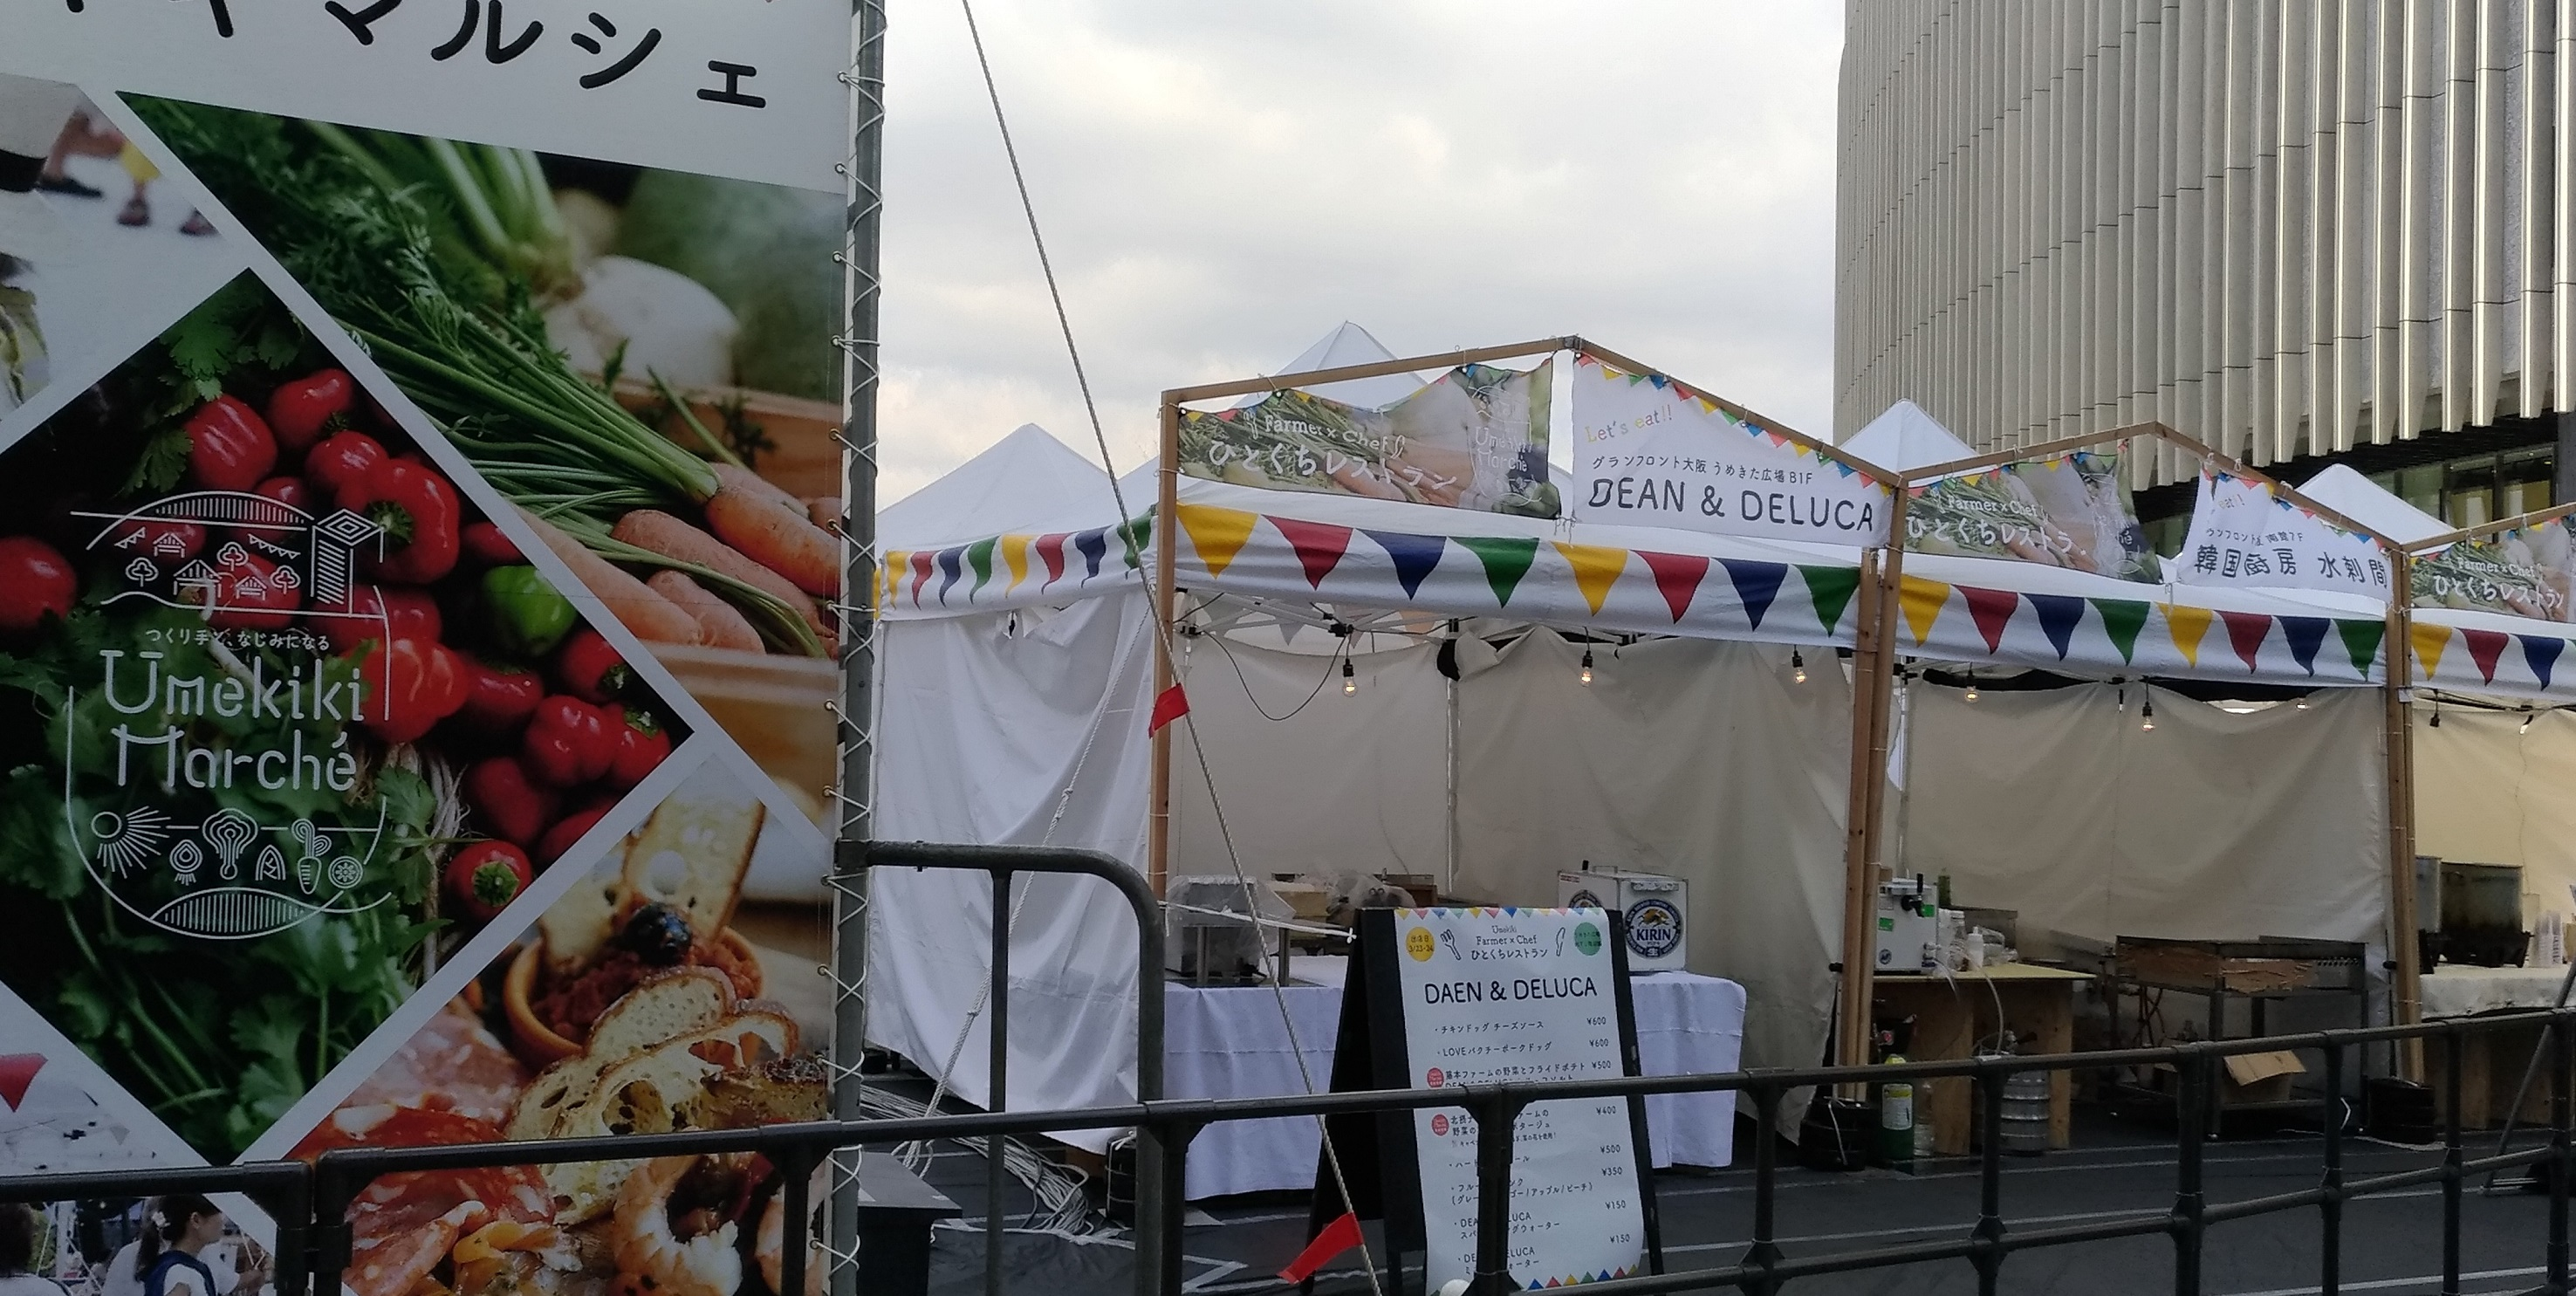 osaka_umeda_events_umekiki_1.jpg